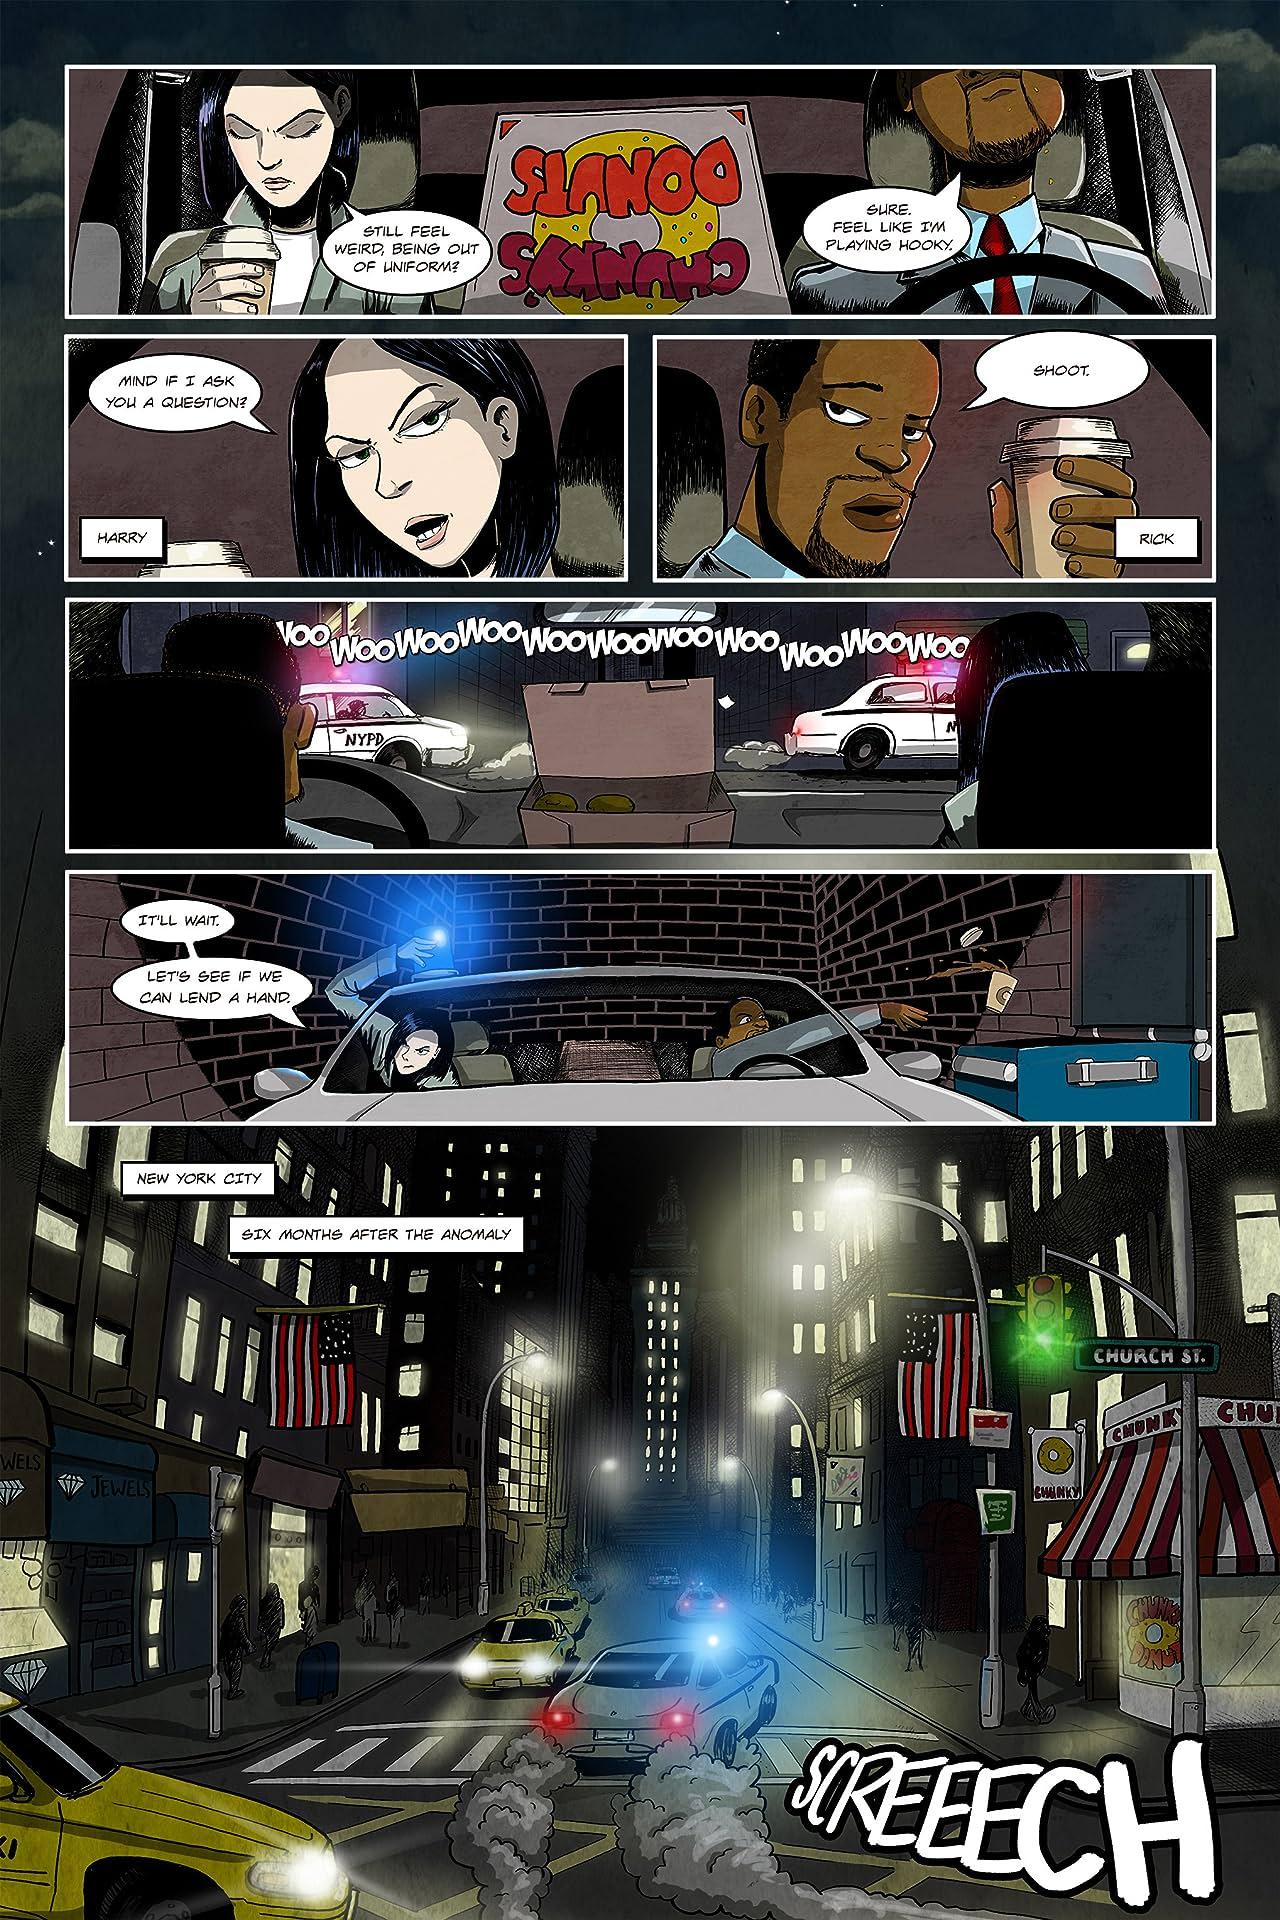 NYPD Weird #1